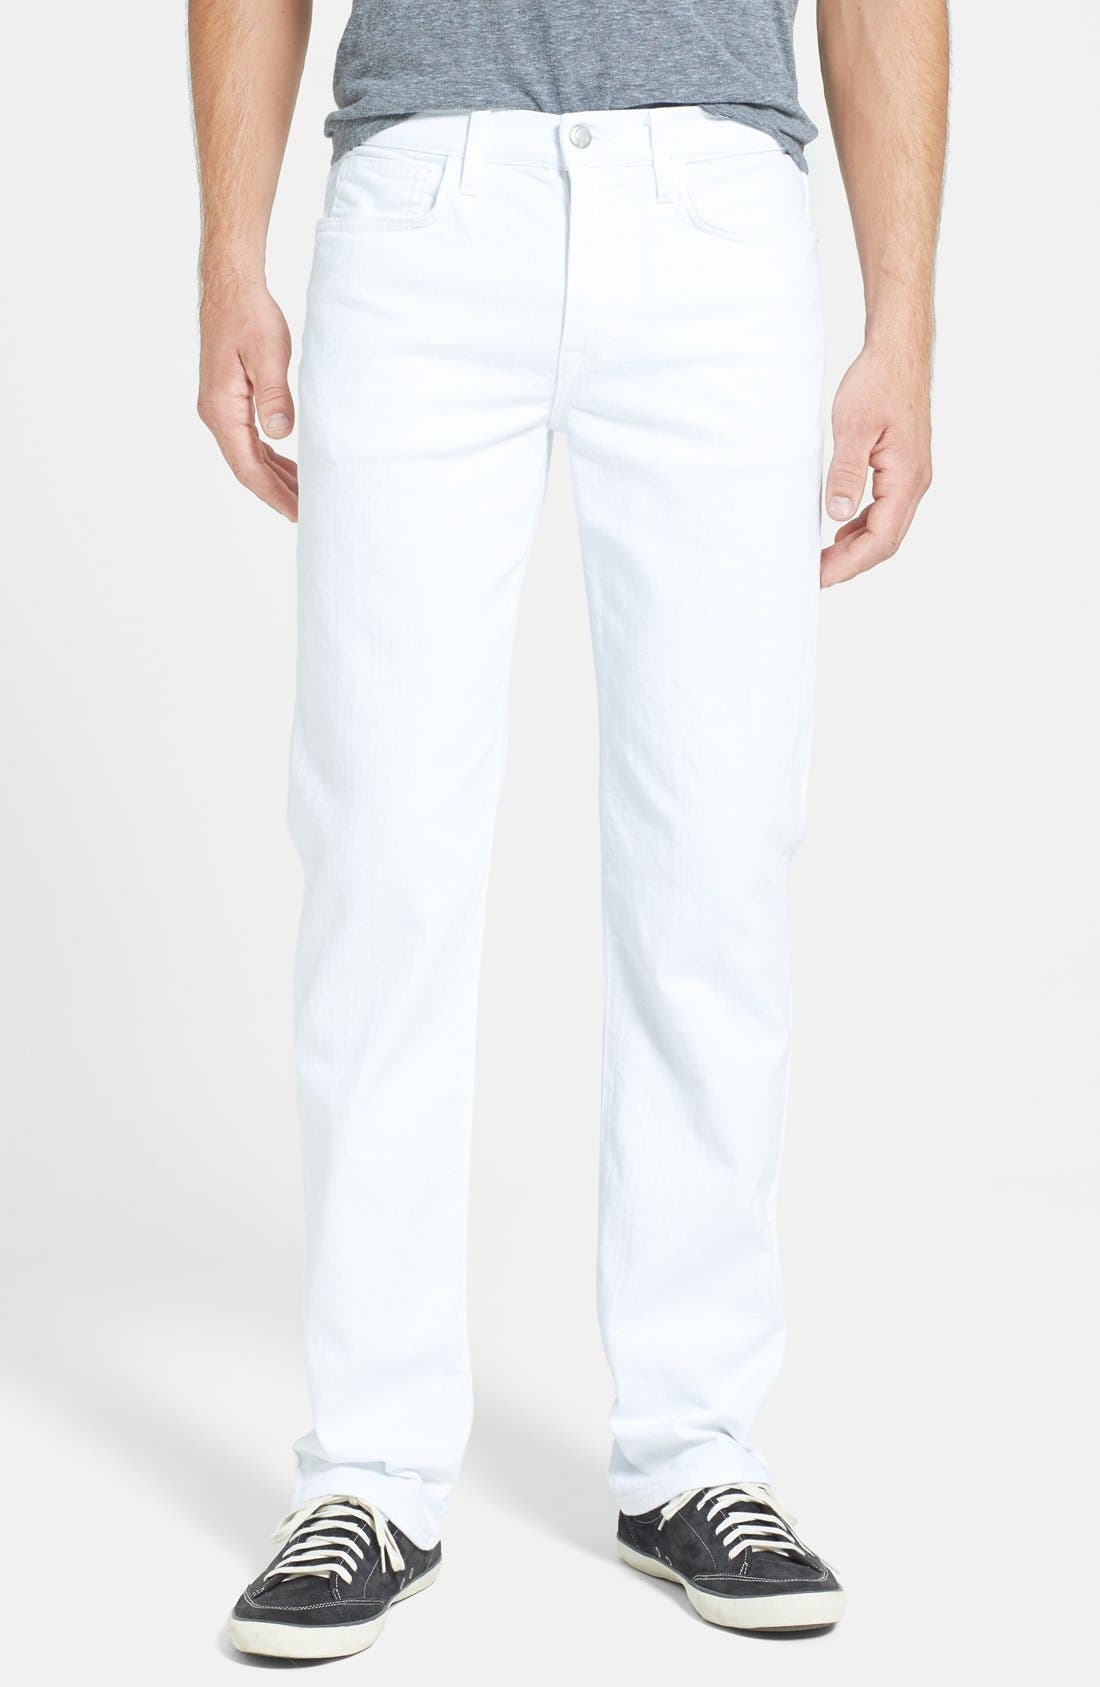 Alternate Image 1 Selected - Joe's 'Classic' Straight Leg Jeans (Optic White)